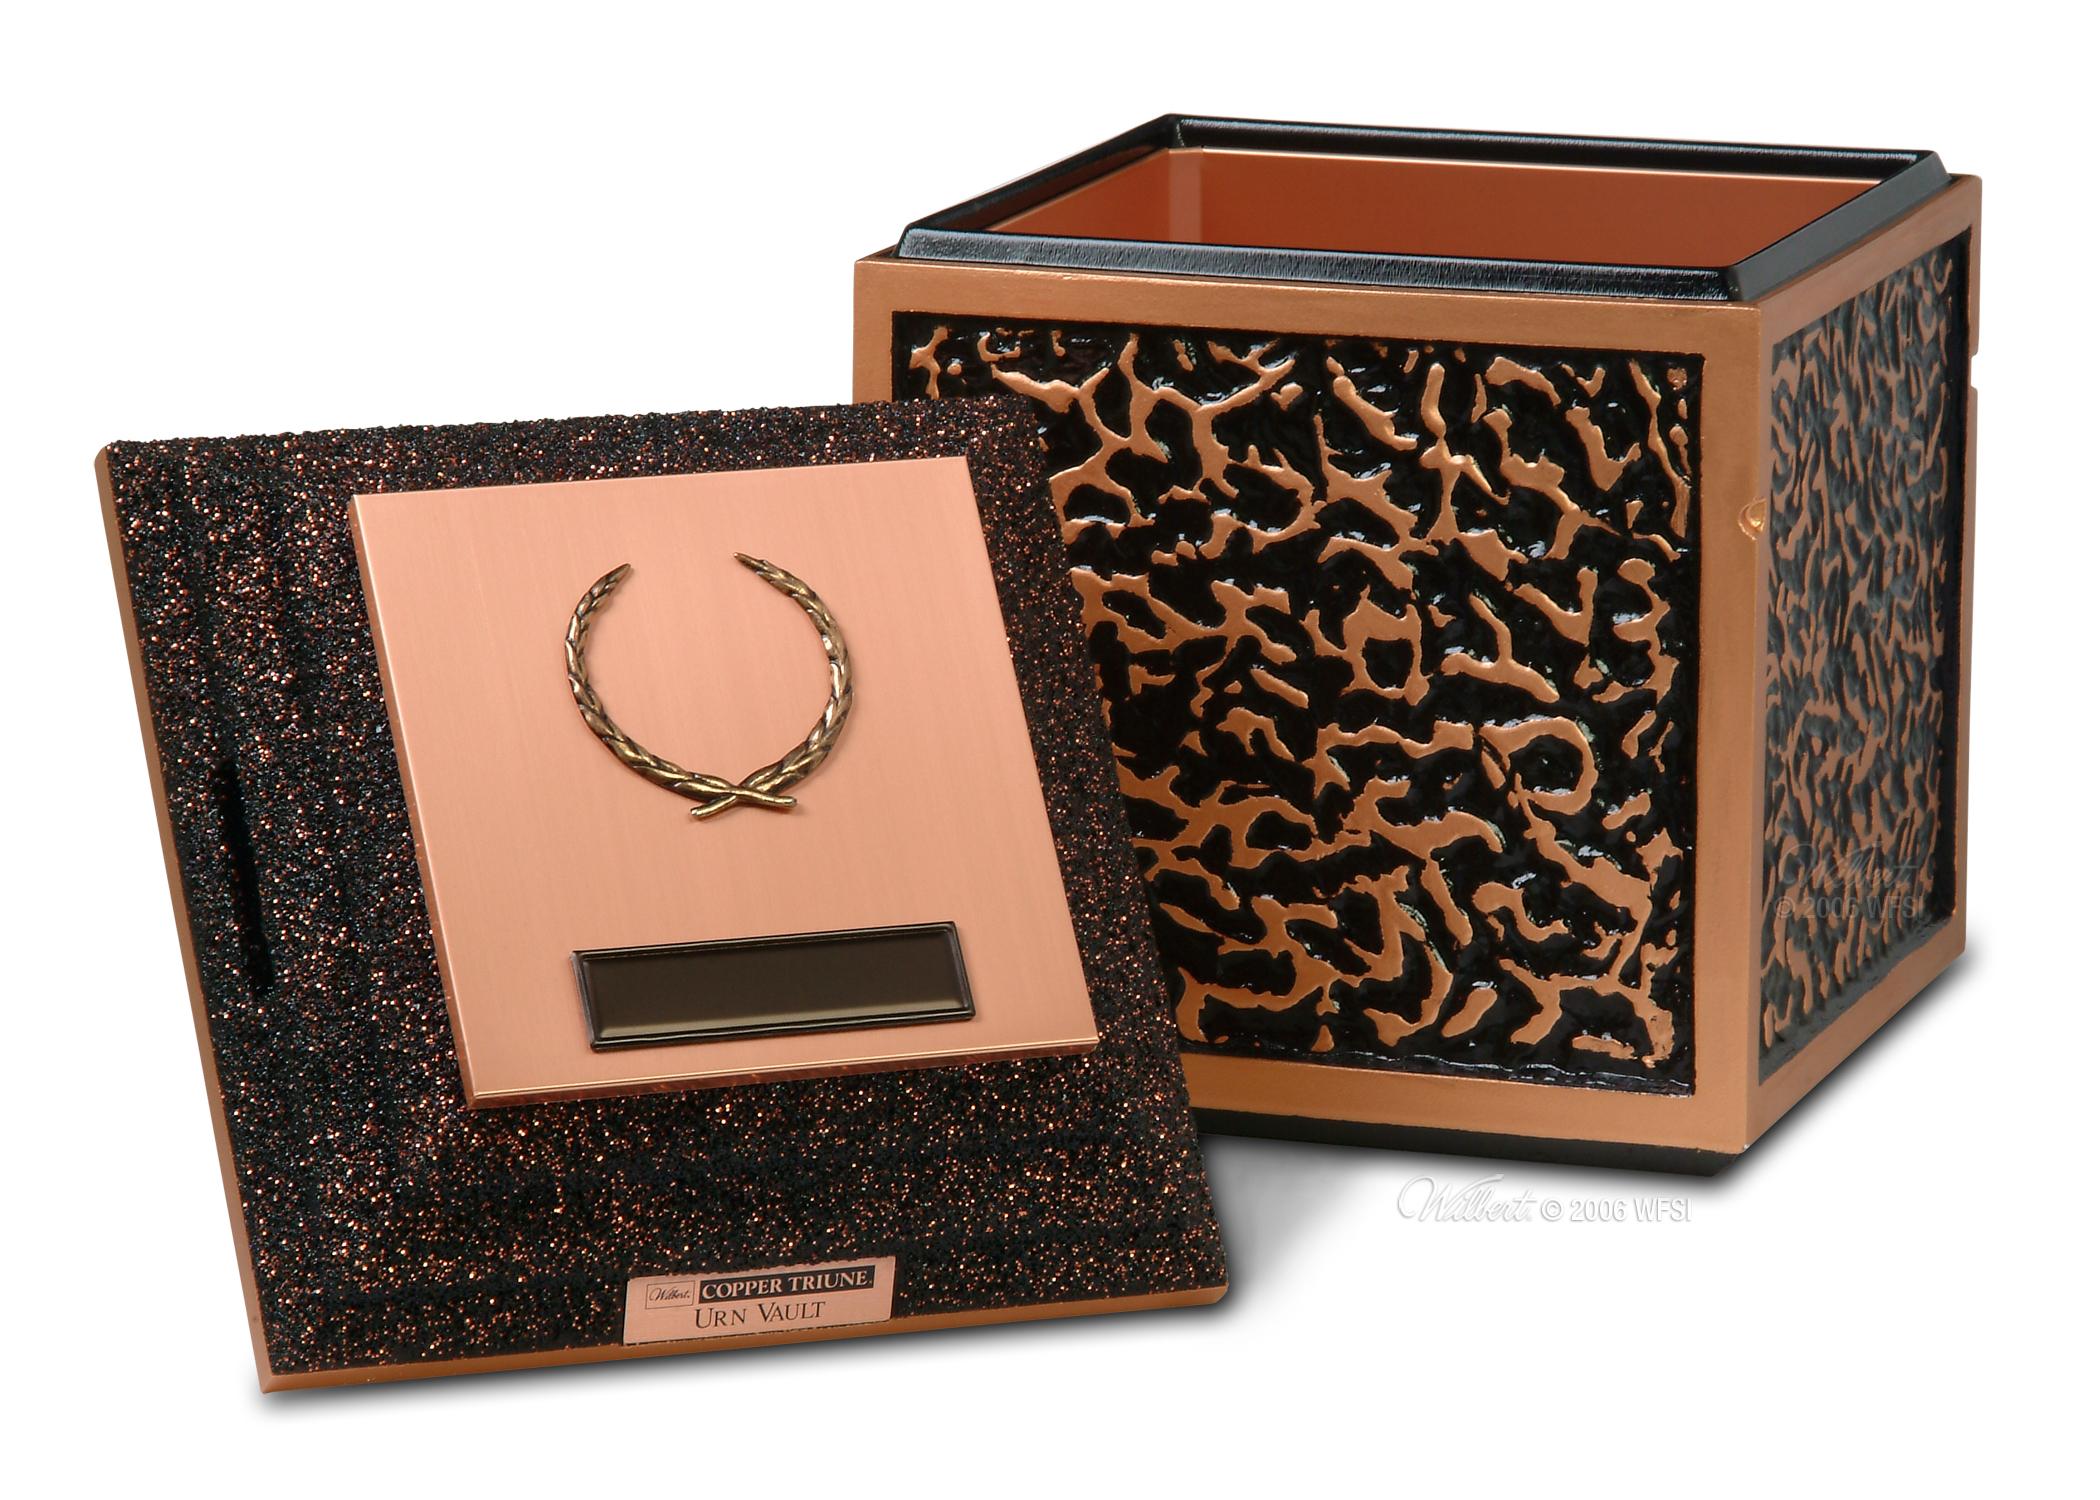 Copper Cremation Urn Vault